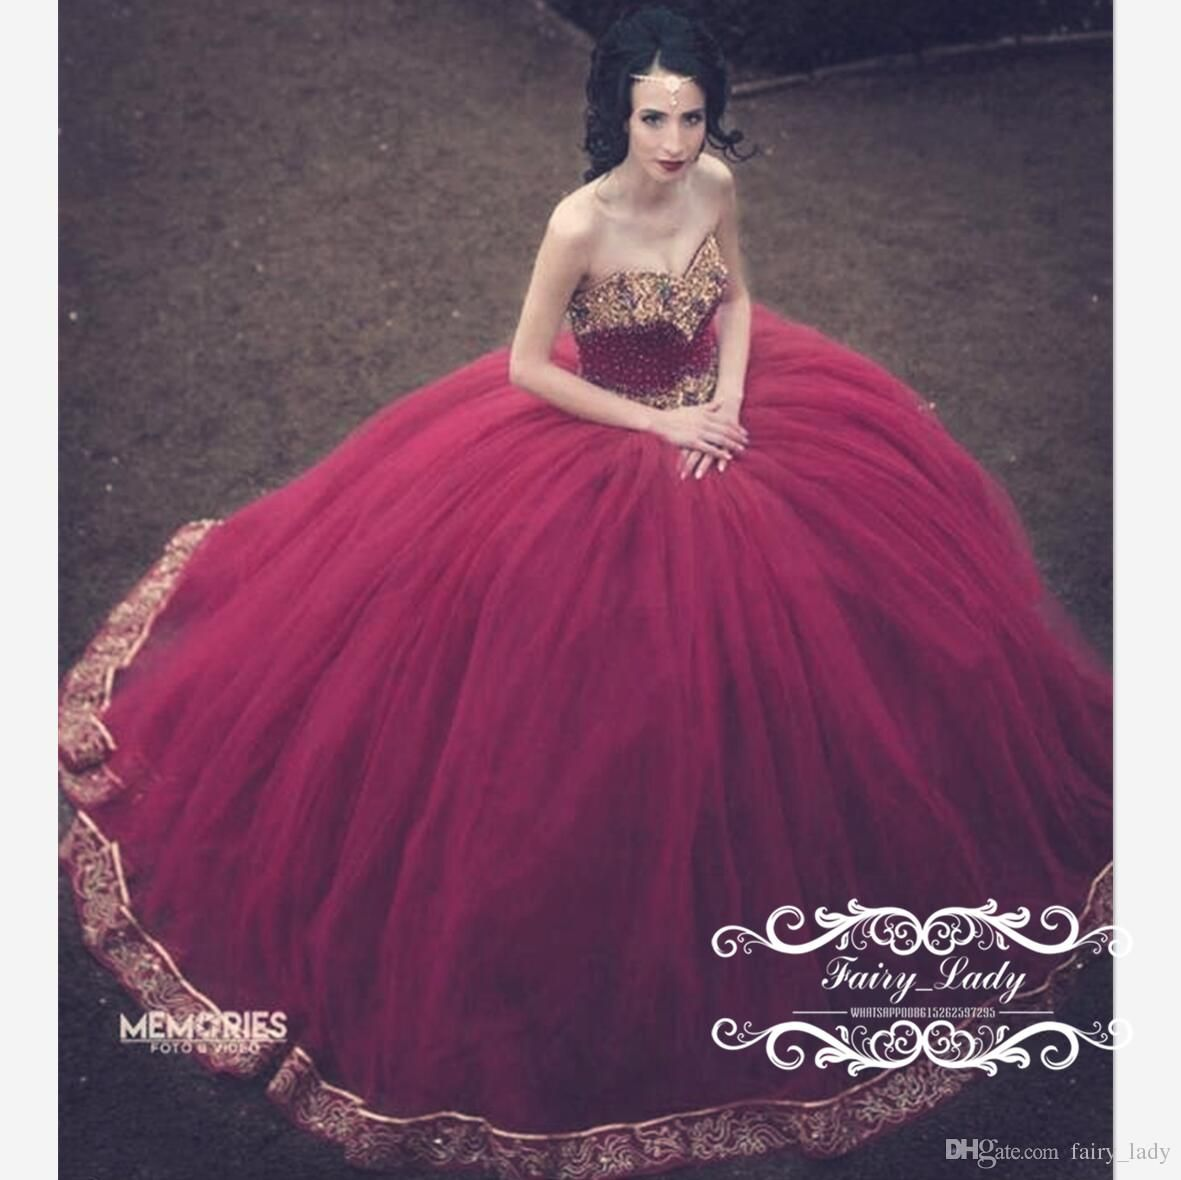 Pin de Tracy Chen en Quinceanera Dresses | Pinterest